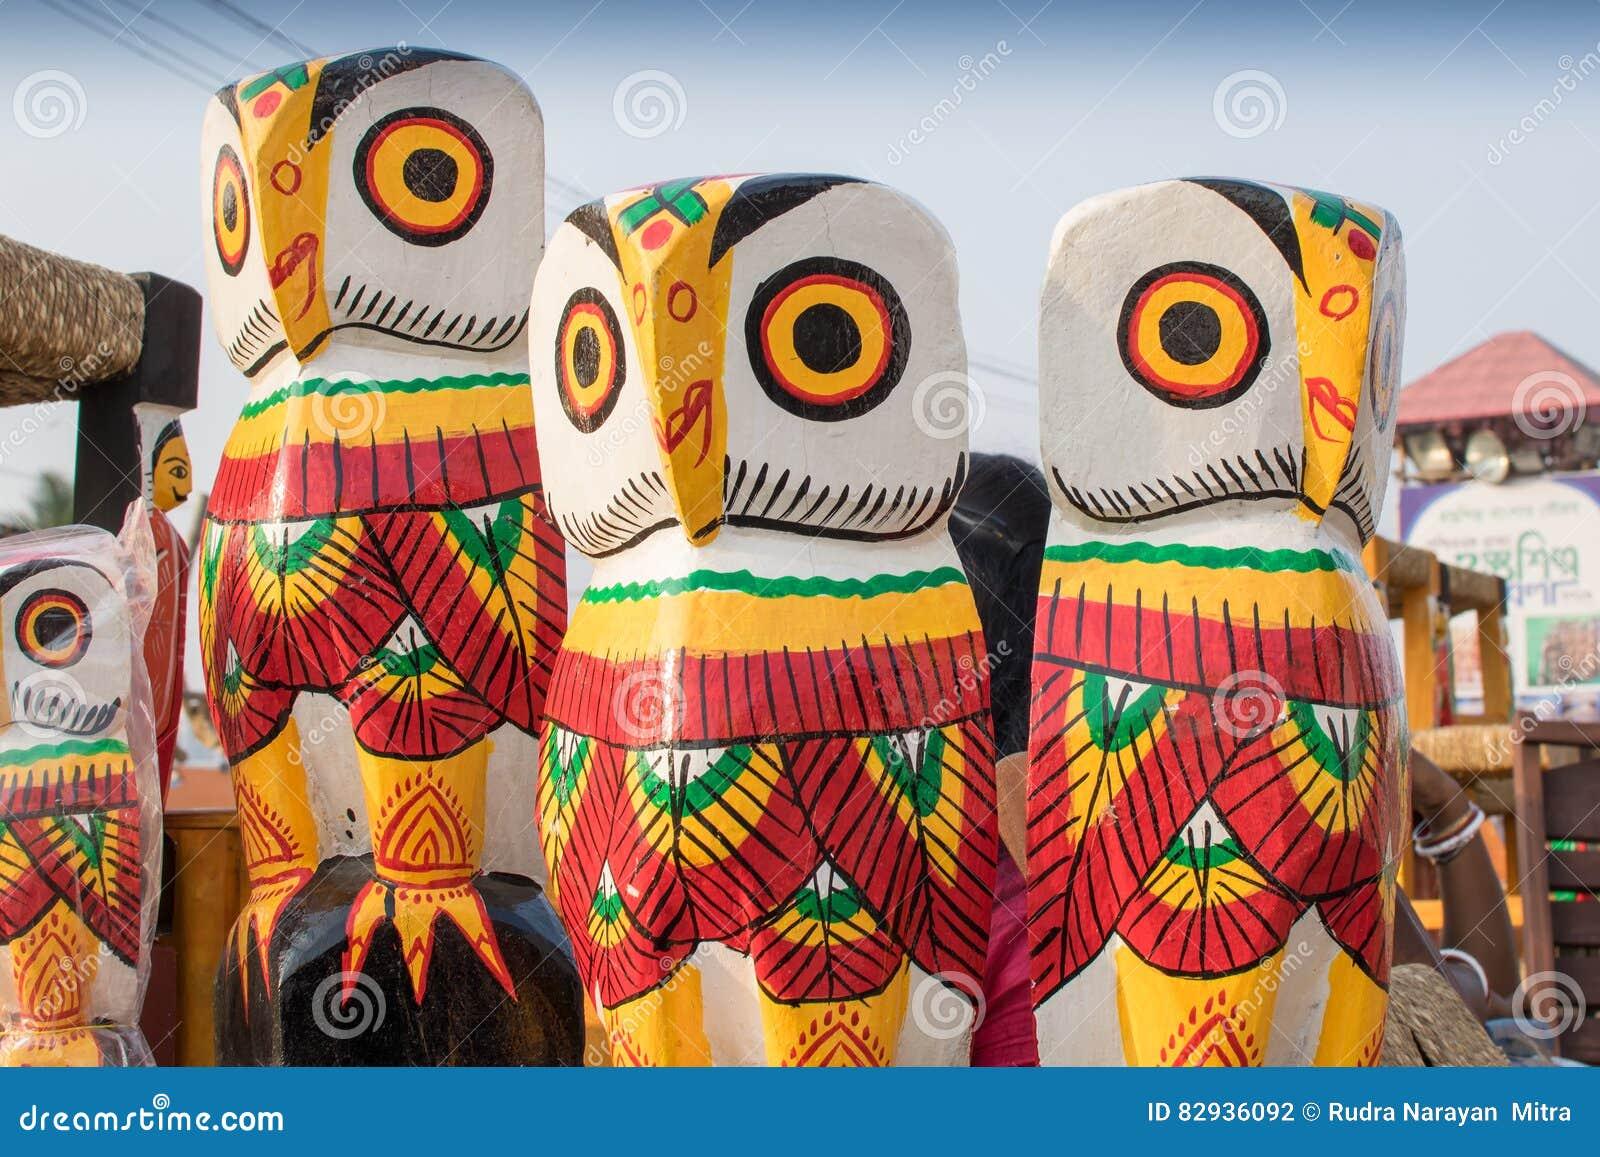 Wooden Owls Handicraft Items On Display Kolkata Editorial